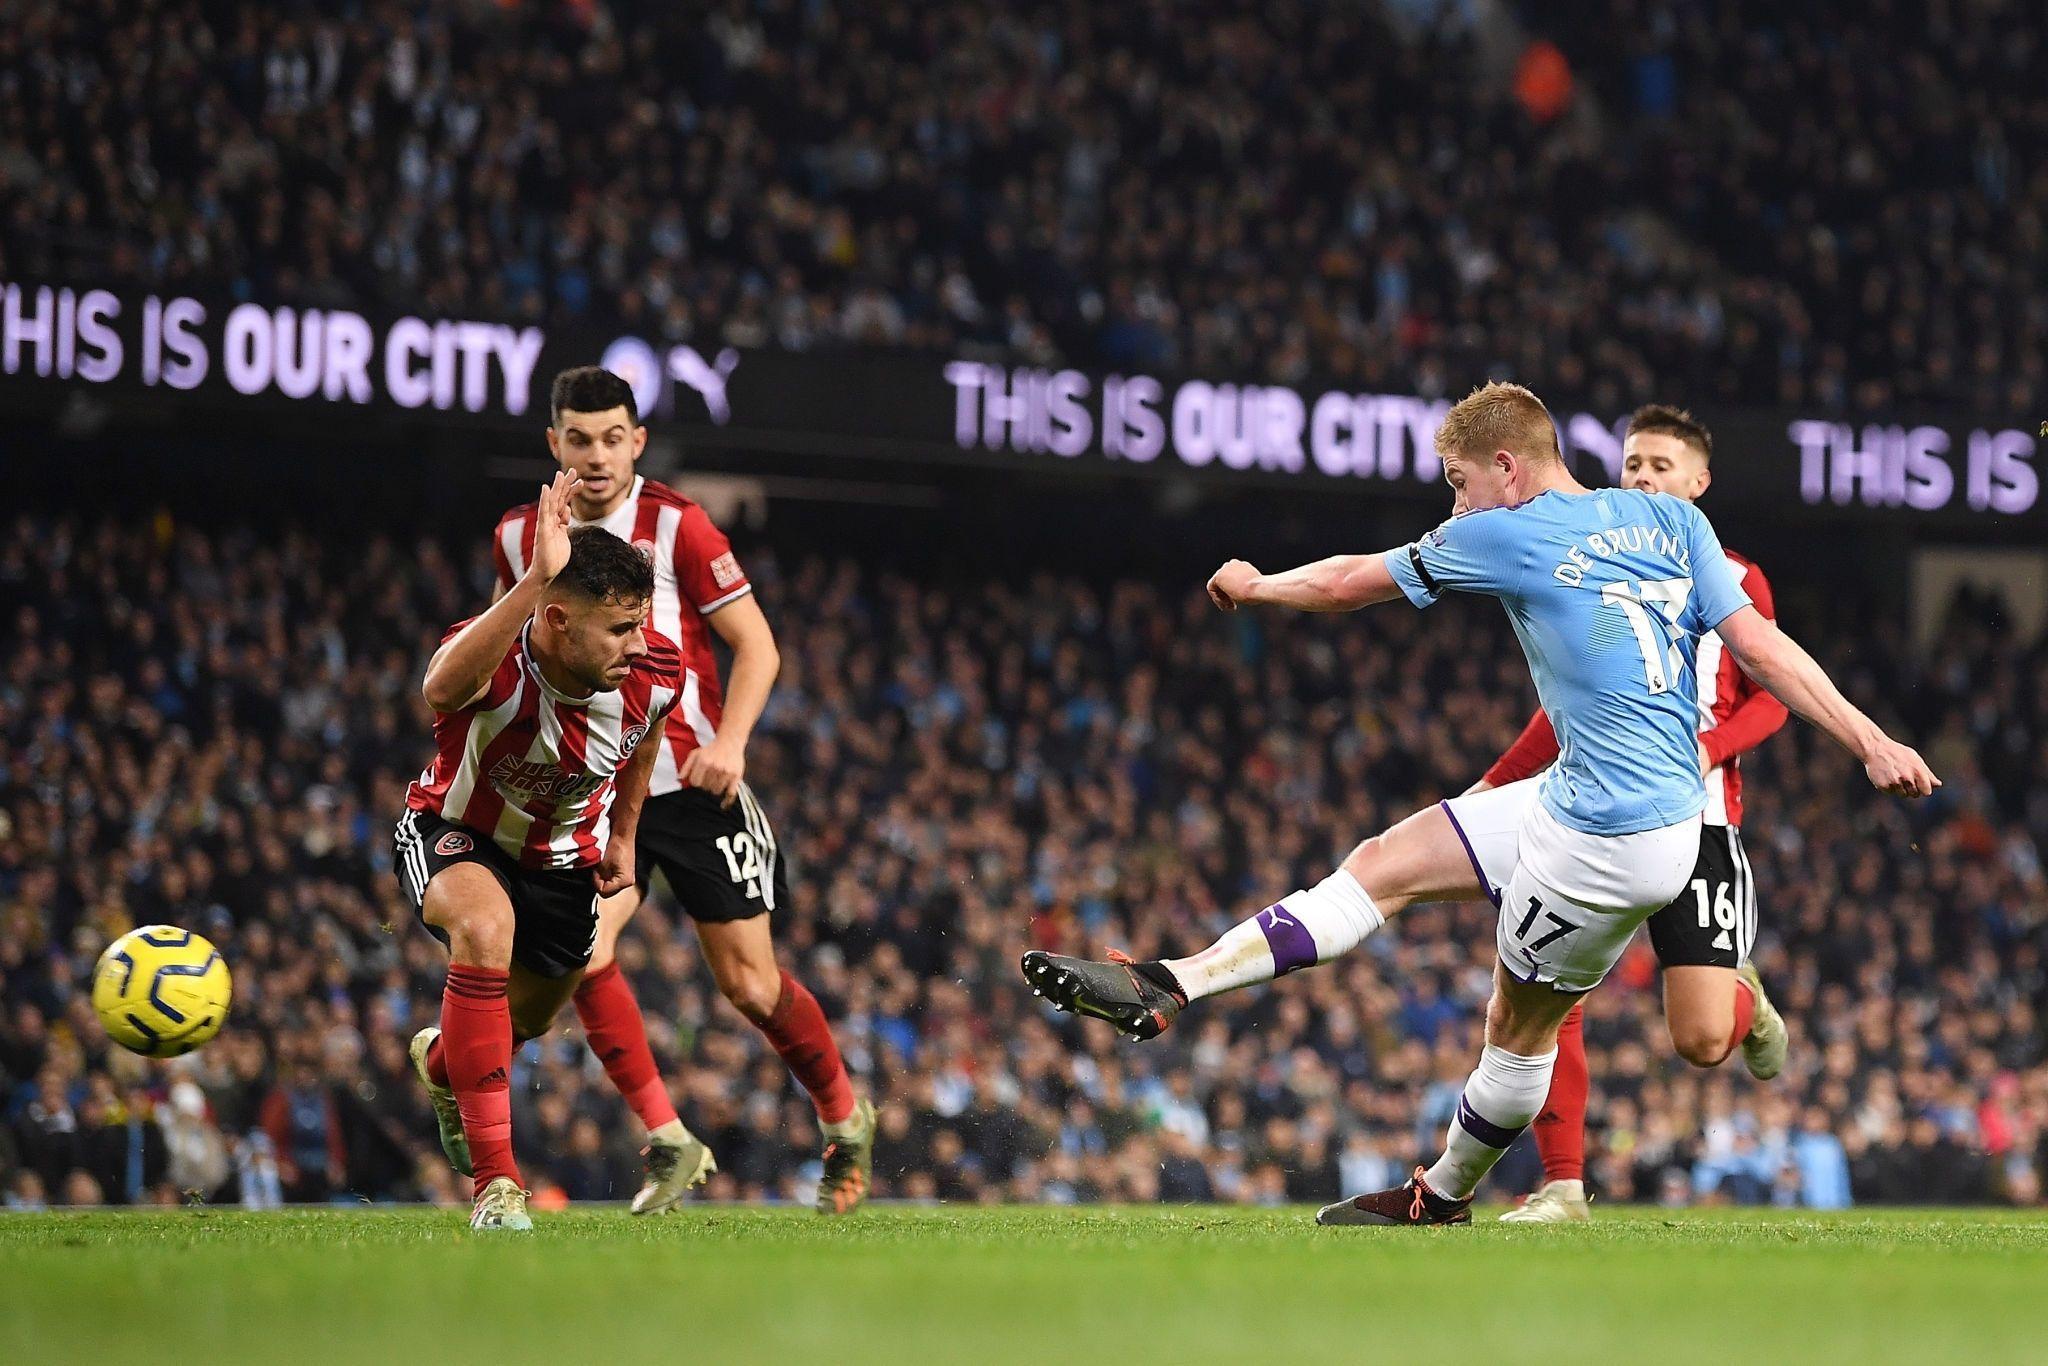 Prediksi Pertandingan Sheffield United vs Manchester City Judi Bola Online BK8